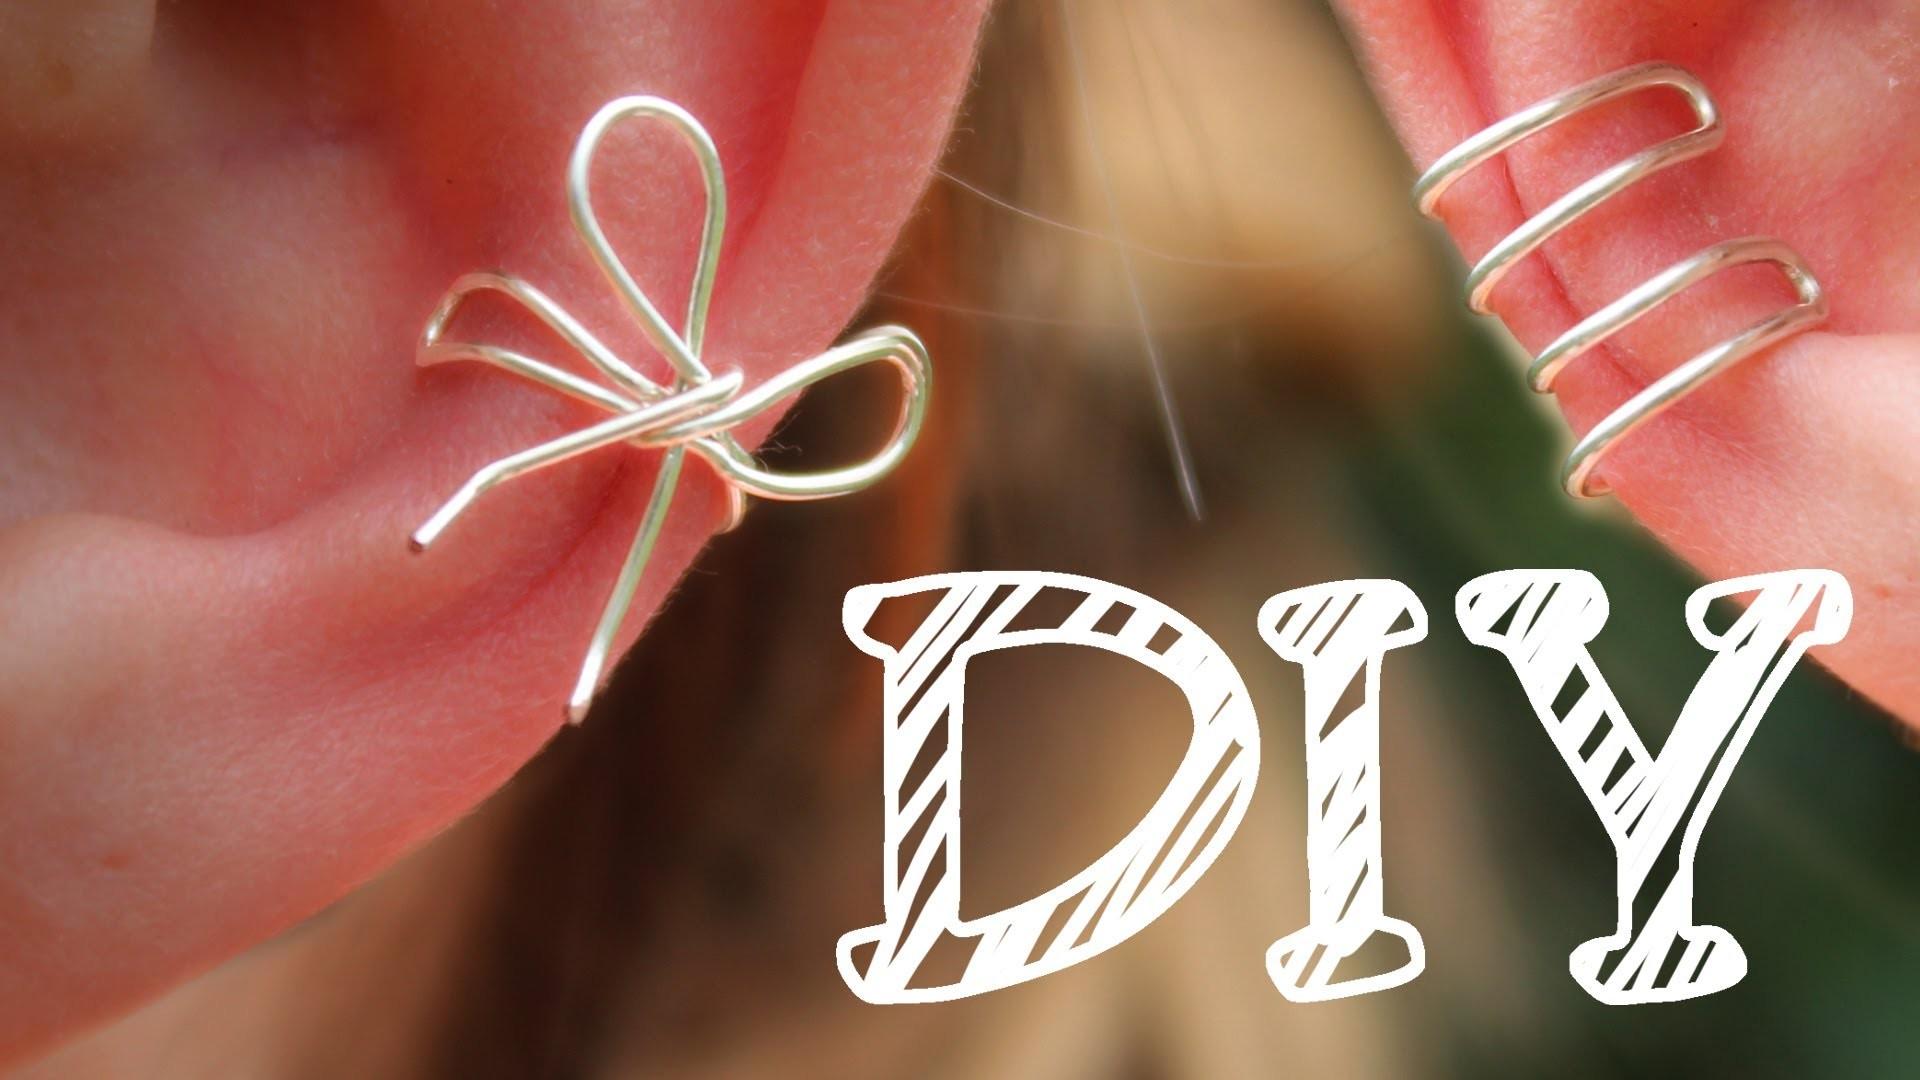 |DIY| Ohrklemme aus Draht - Ear Cuff - Schleife - Ohr-Manschette - super easy - 3 Varianten